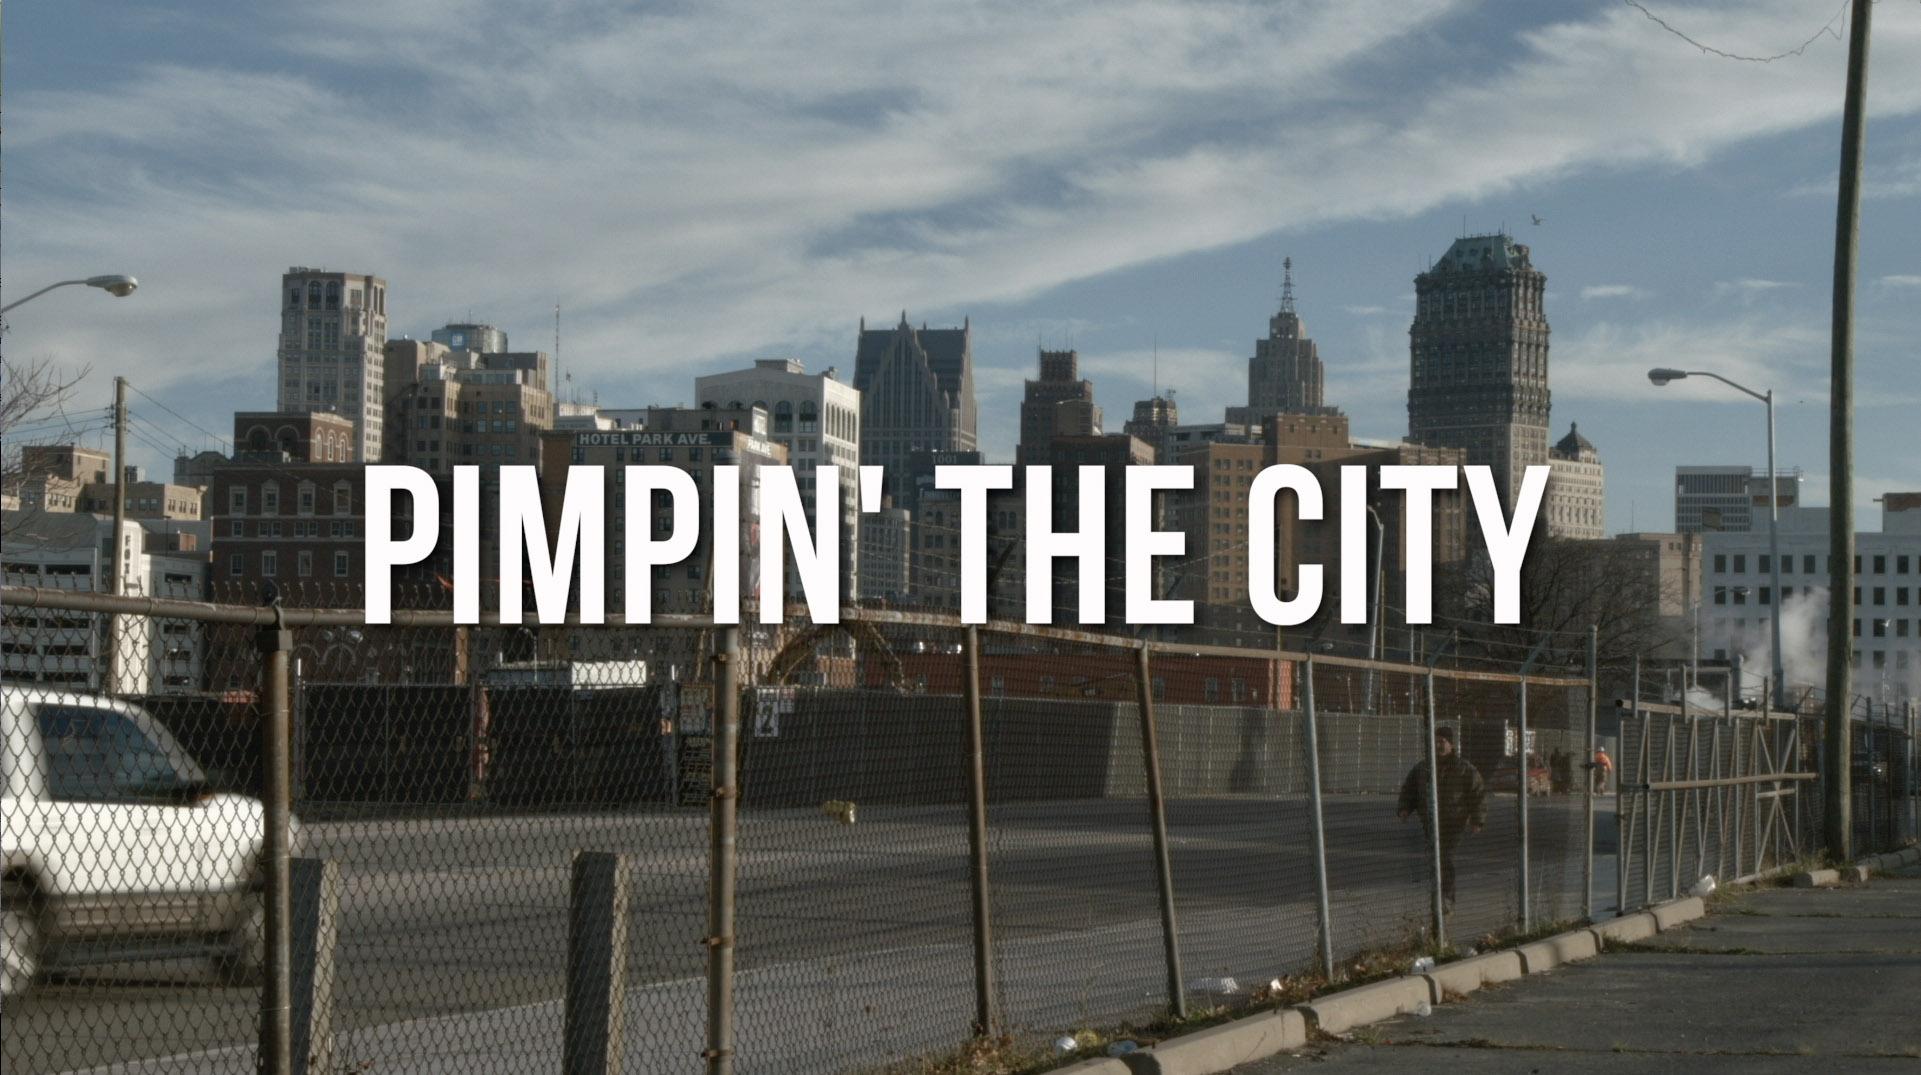 Pimpin' The City